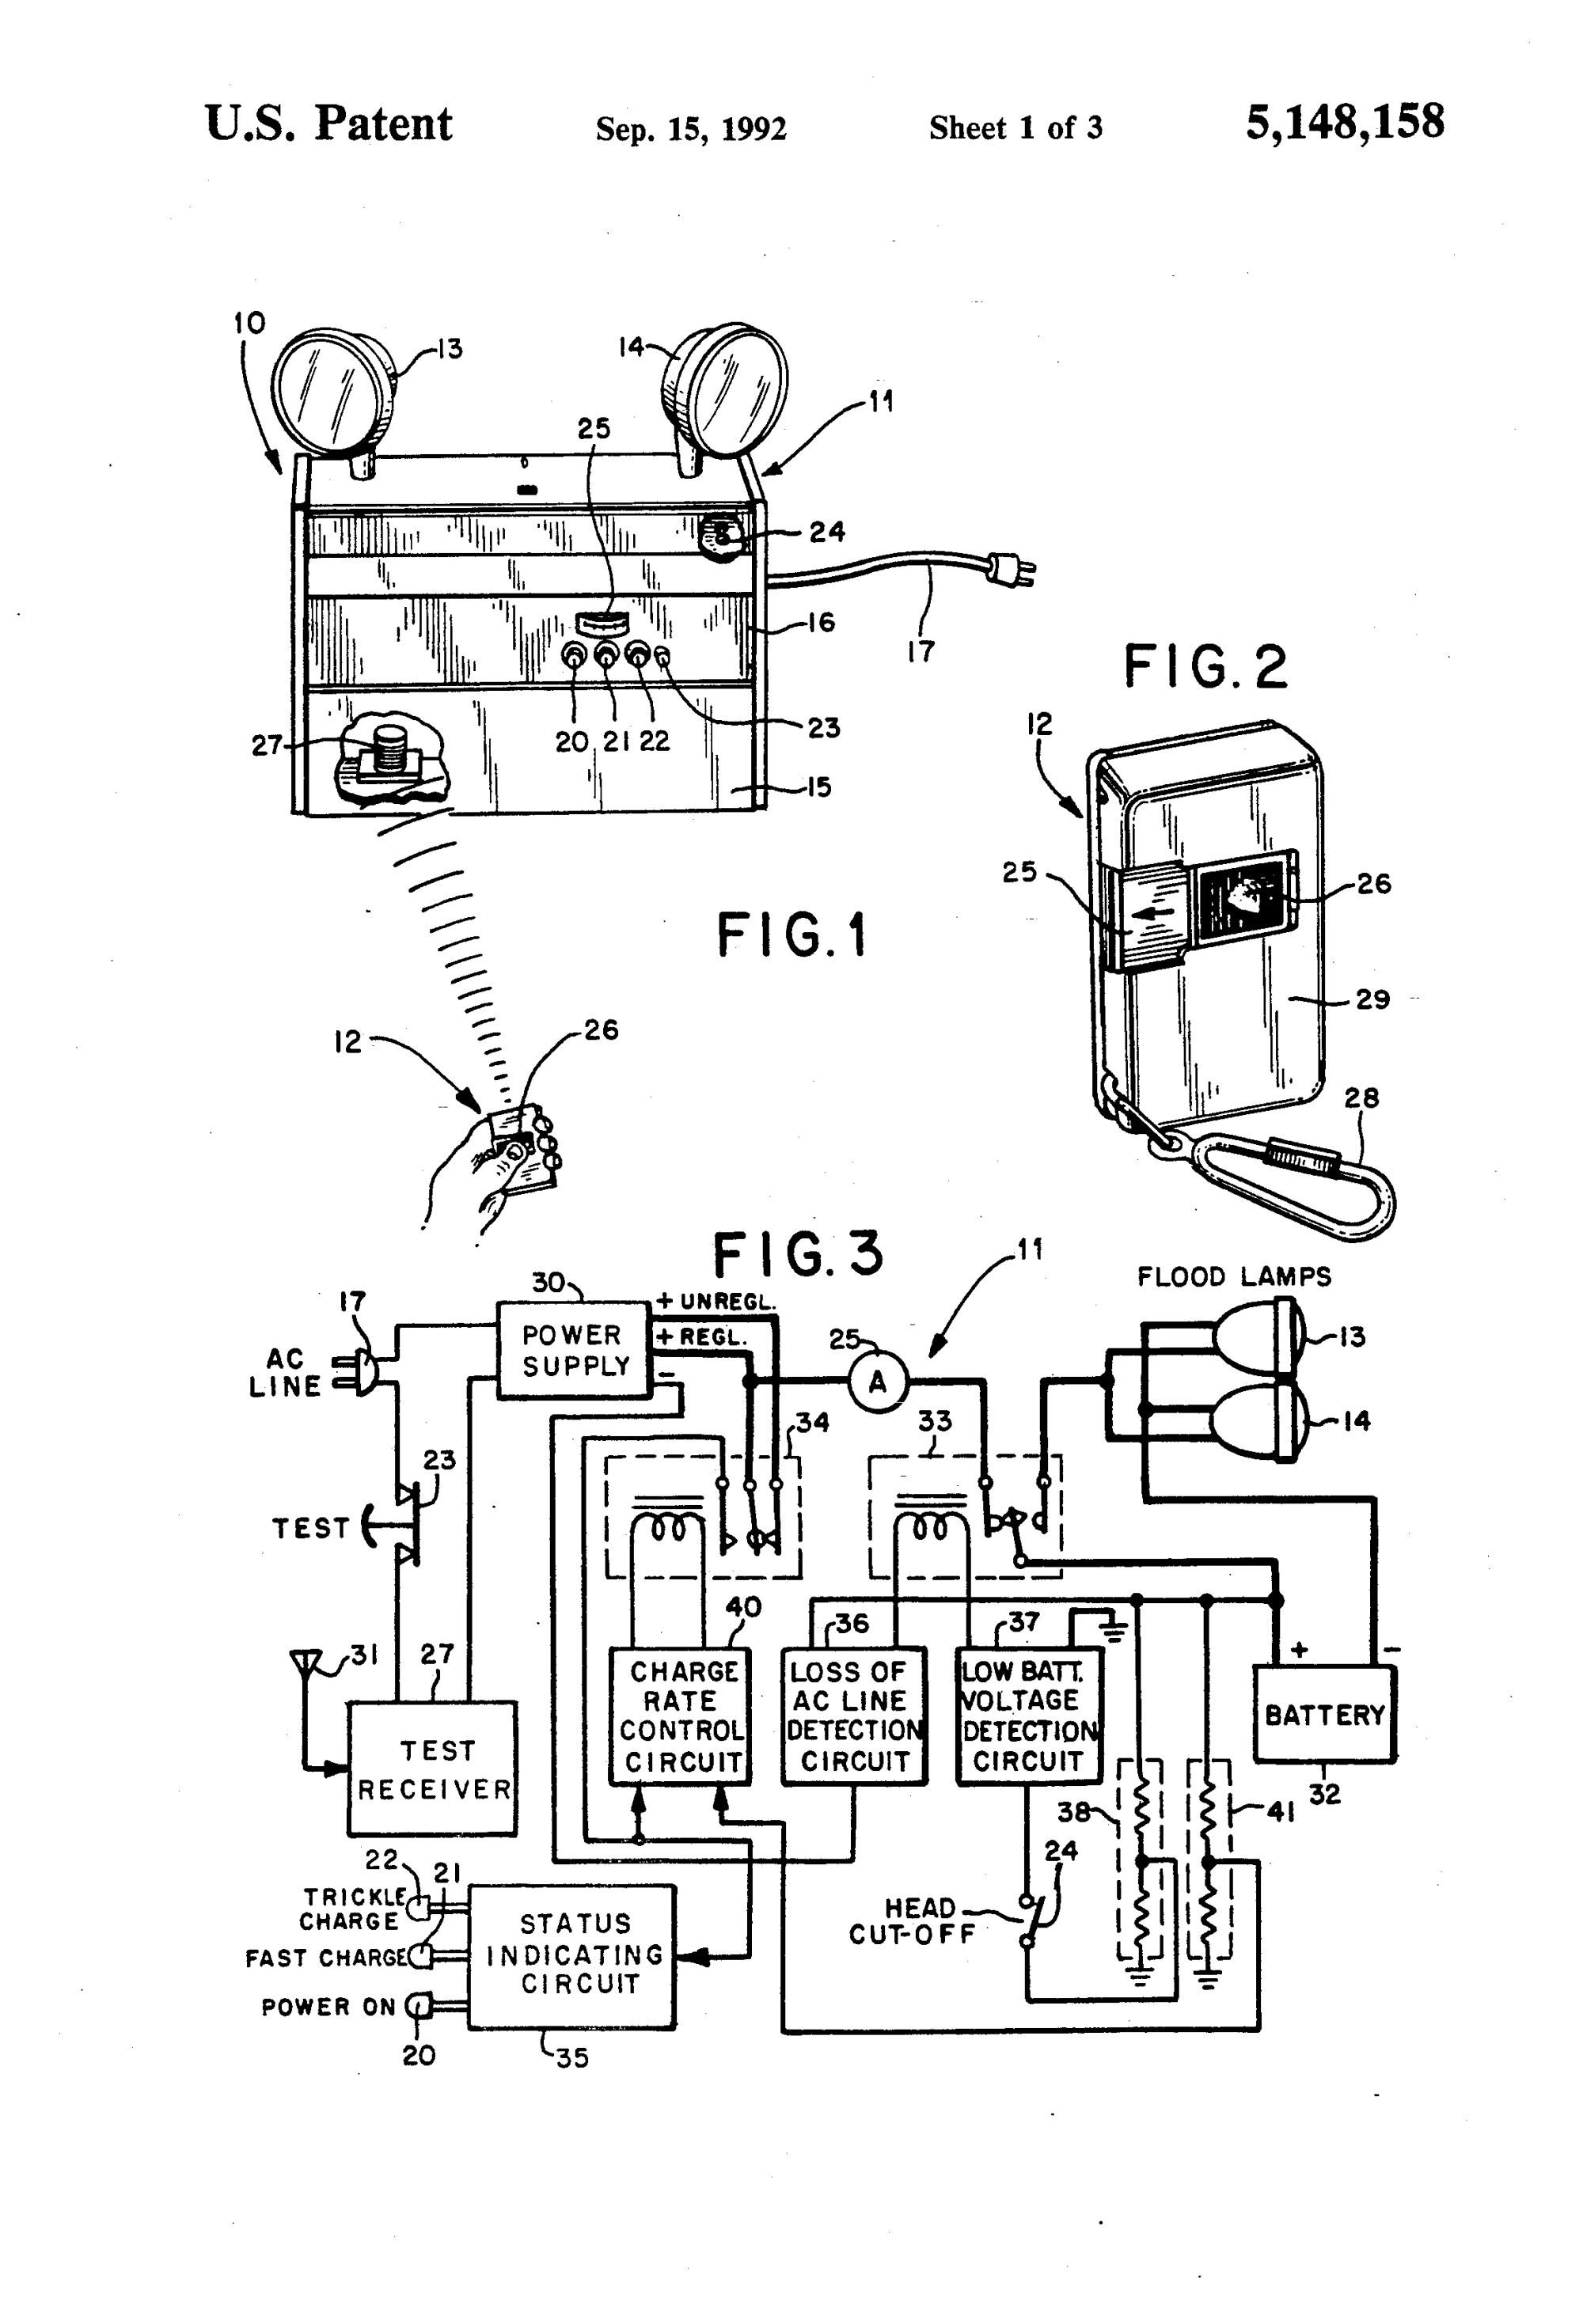 hight resolution of iota emergency ballast wiring diagram iota i 24 emergency ballast wiring diagram emergency lighting wiring